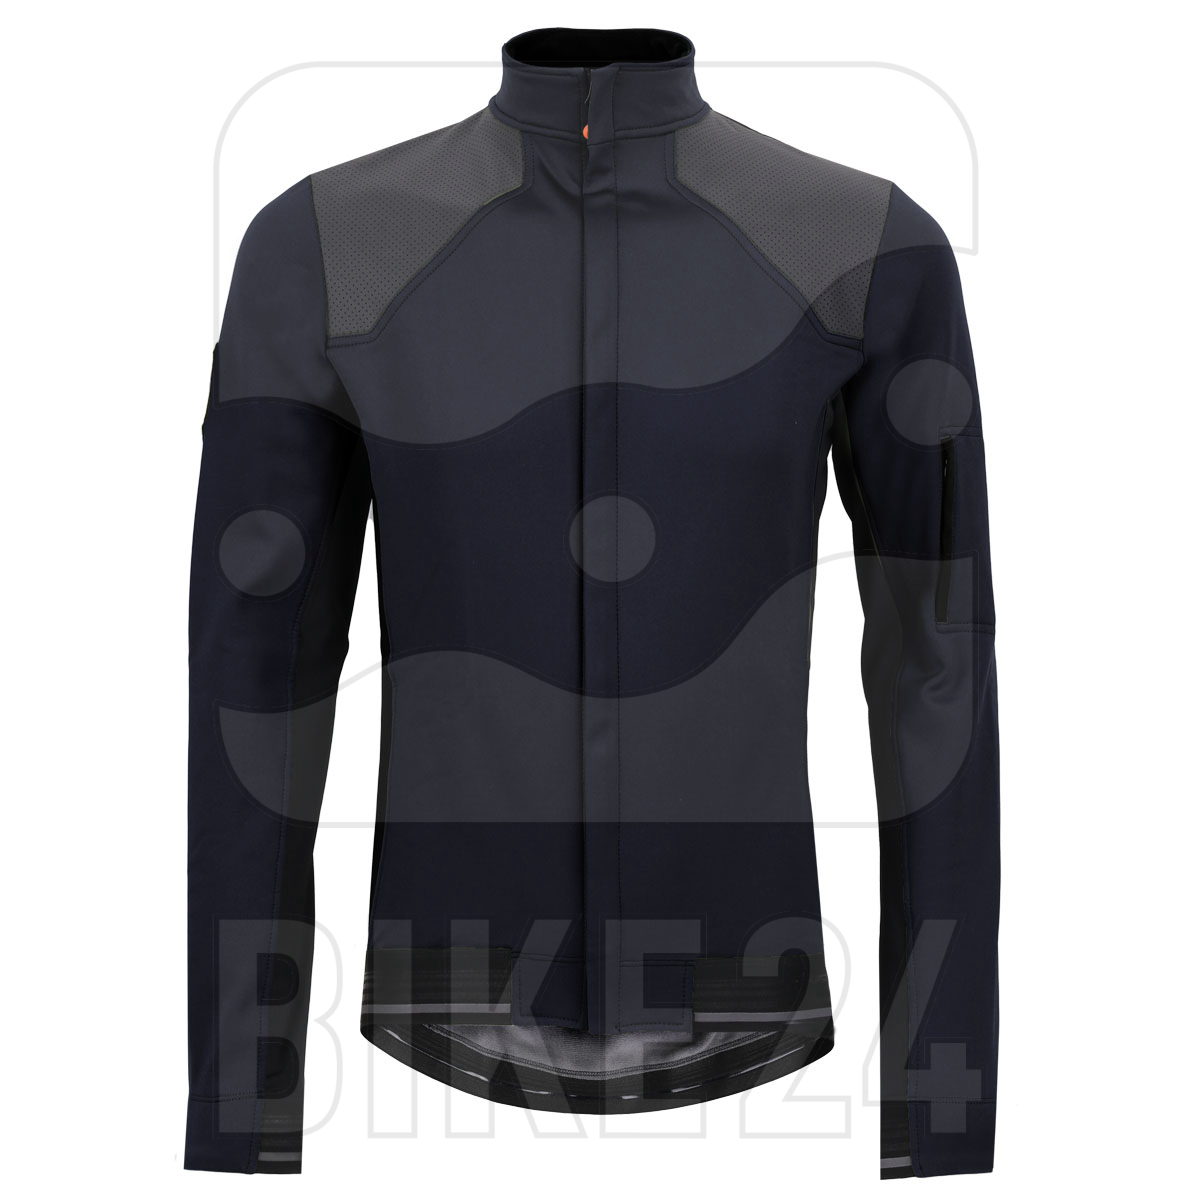 Isadore Sector Jacke - Navy Blue / Black